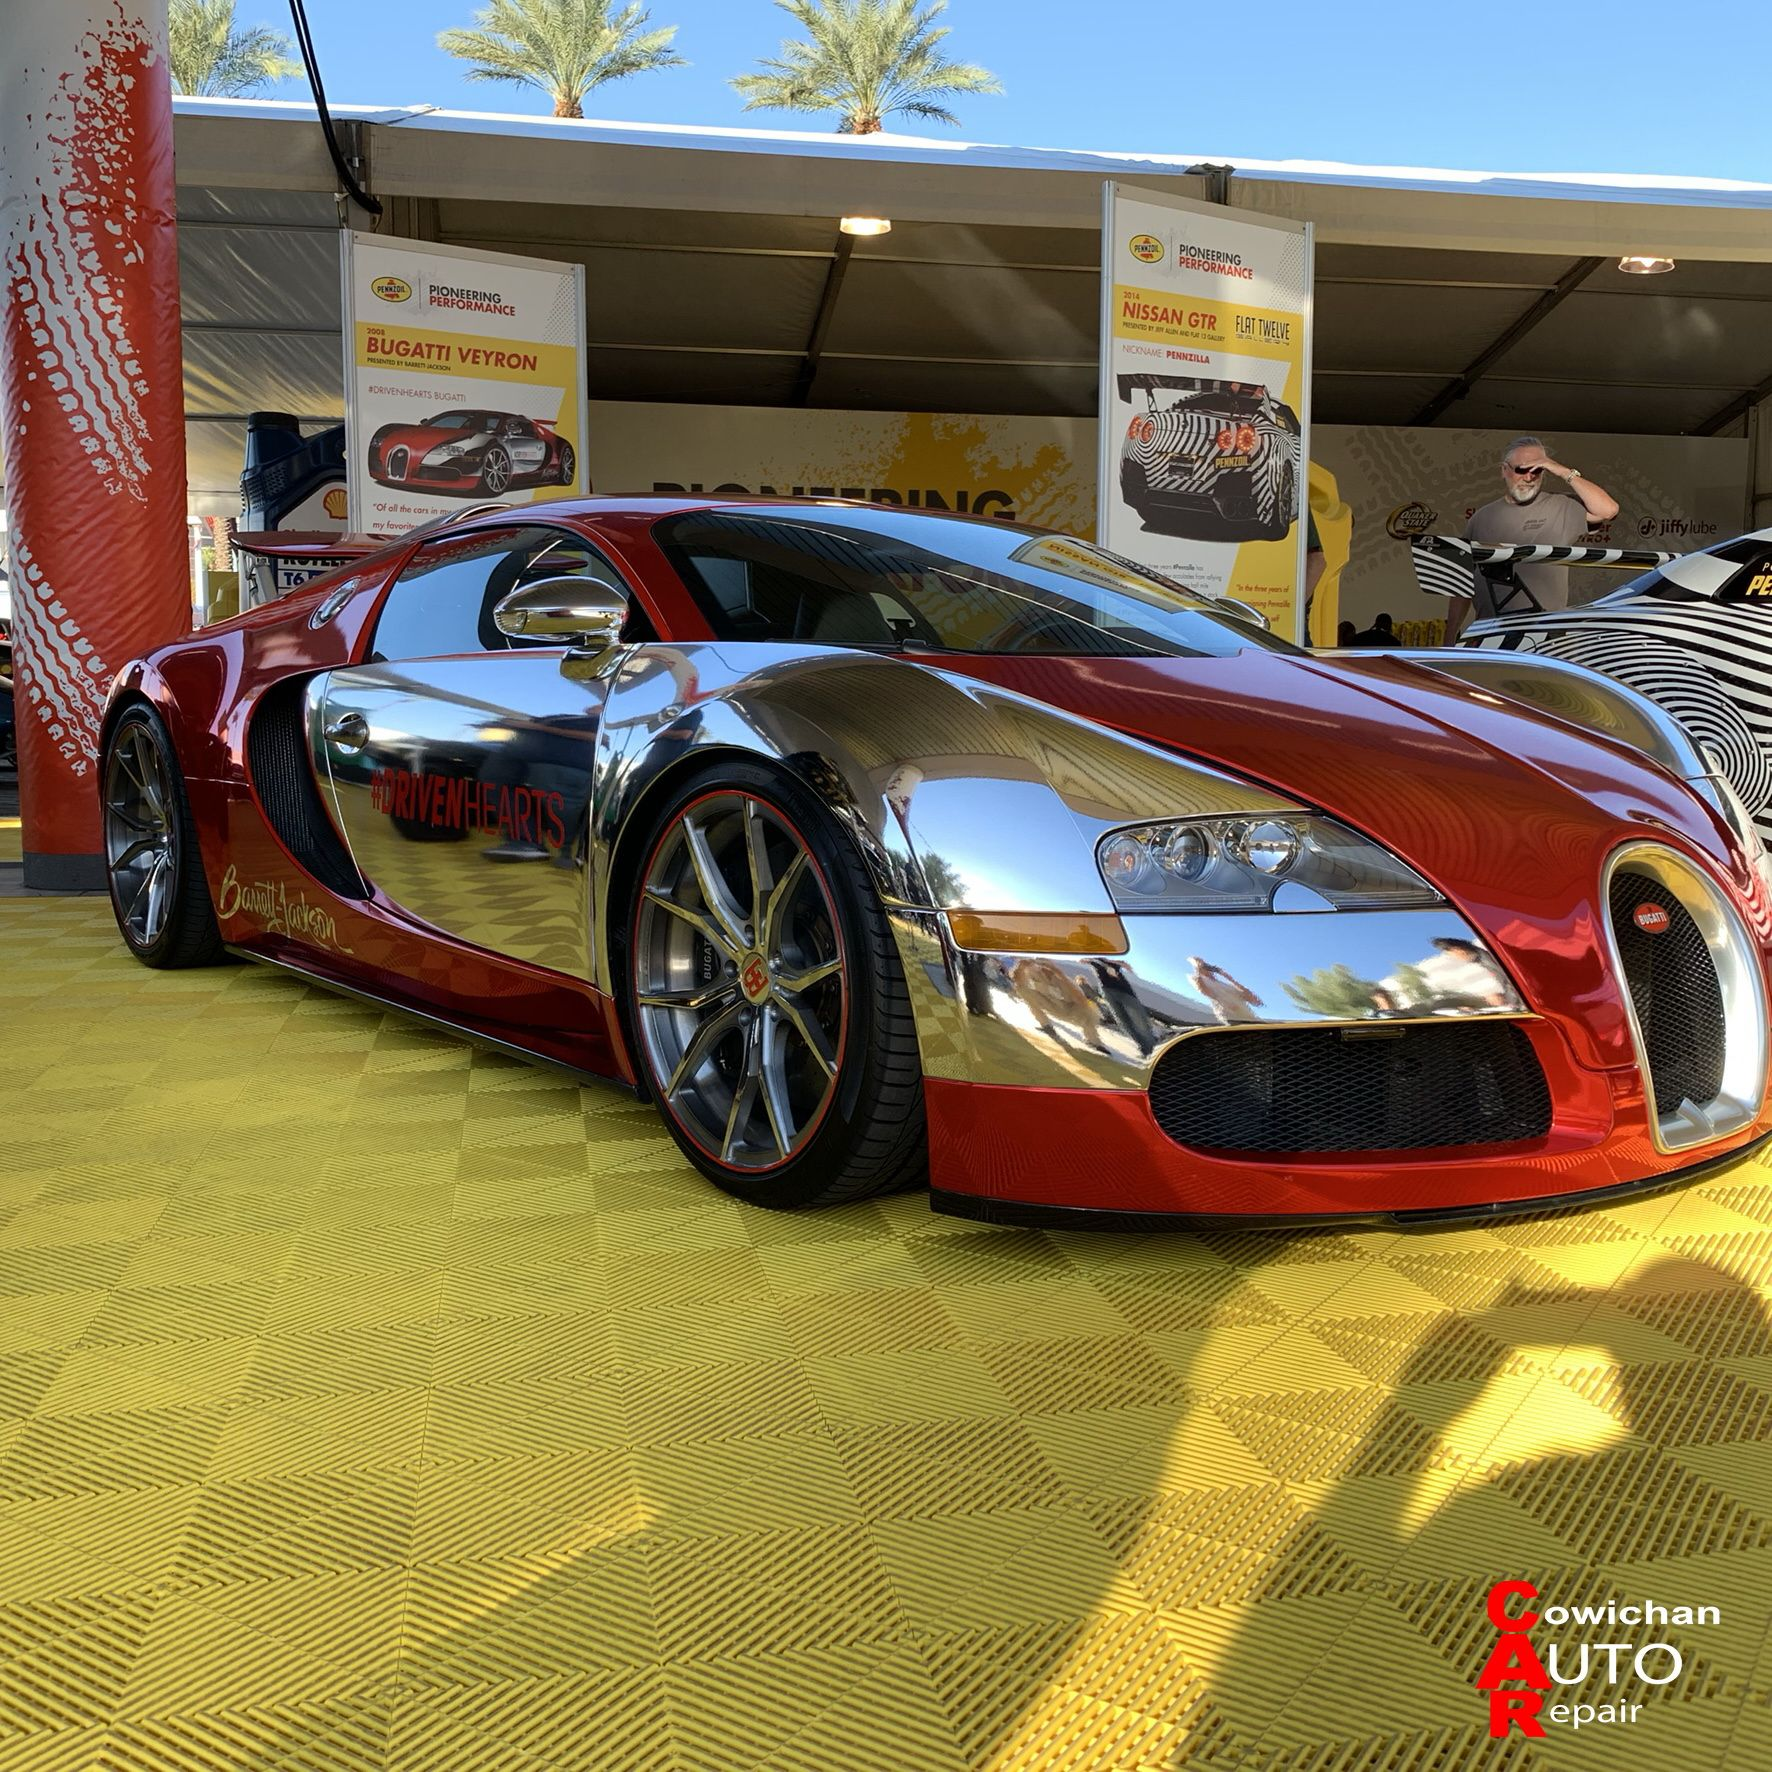 Sema Car Show >> Bugatti Veyron From The 2018 Sema Show In Las Vegas